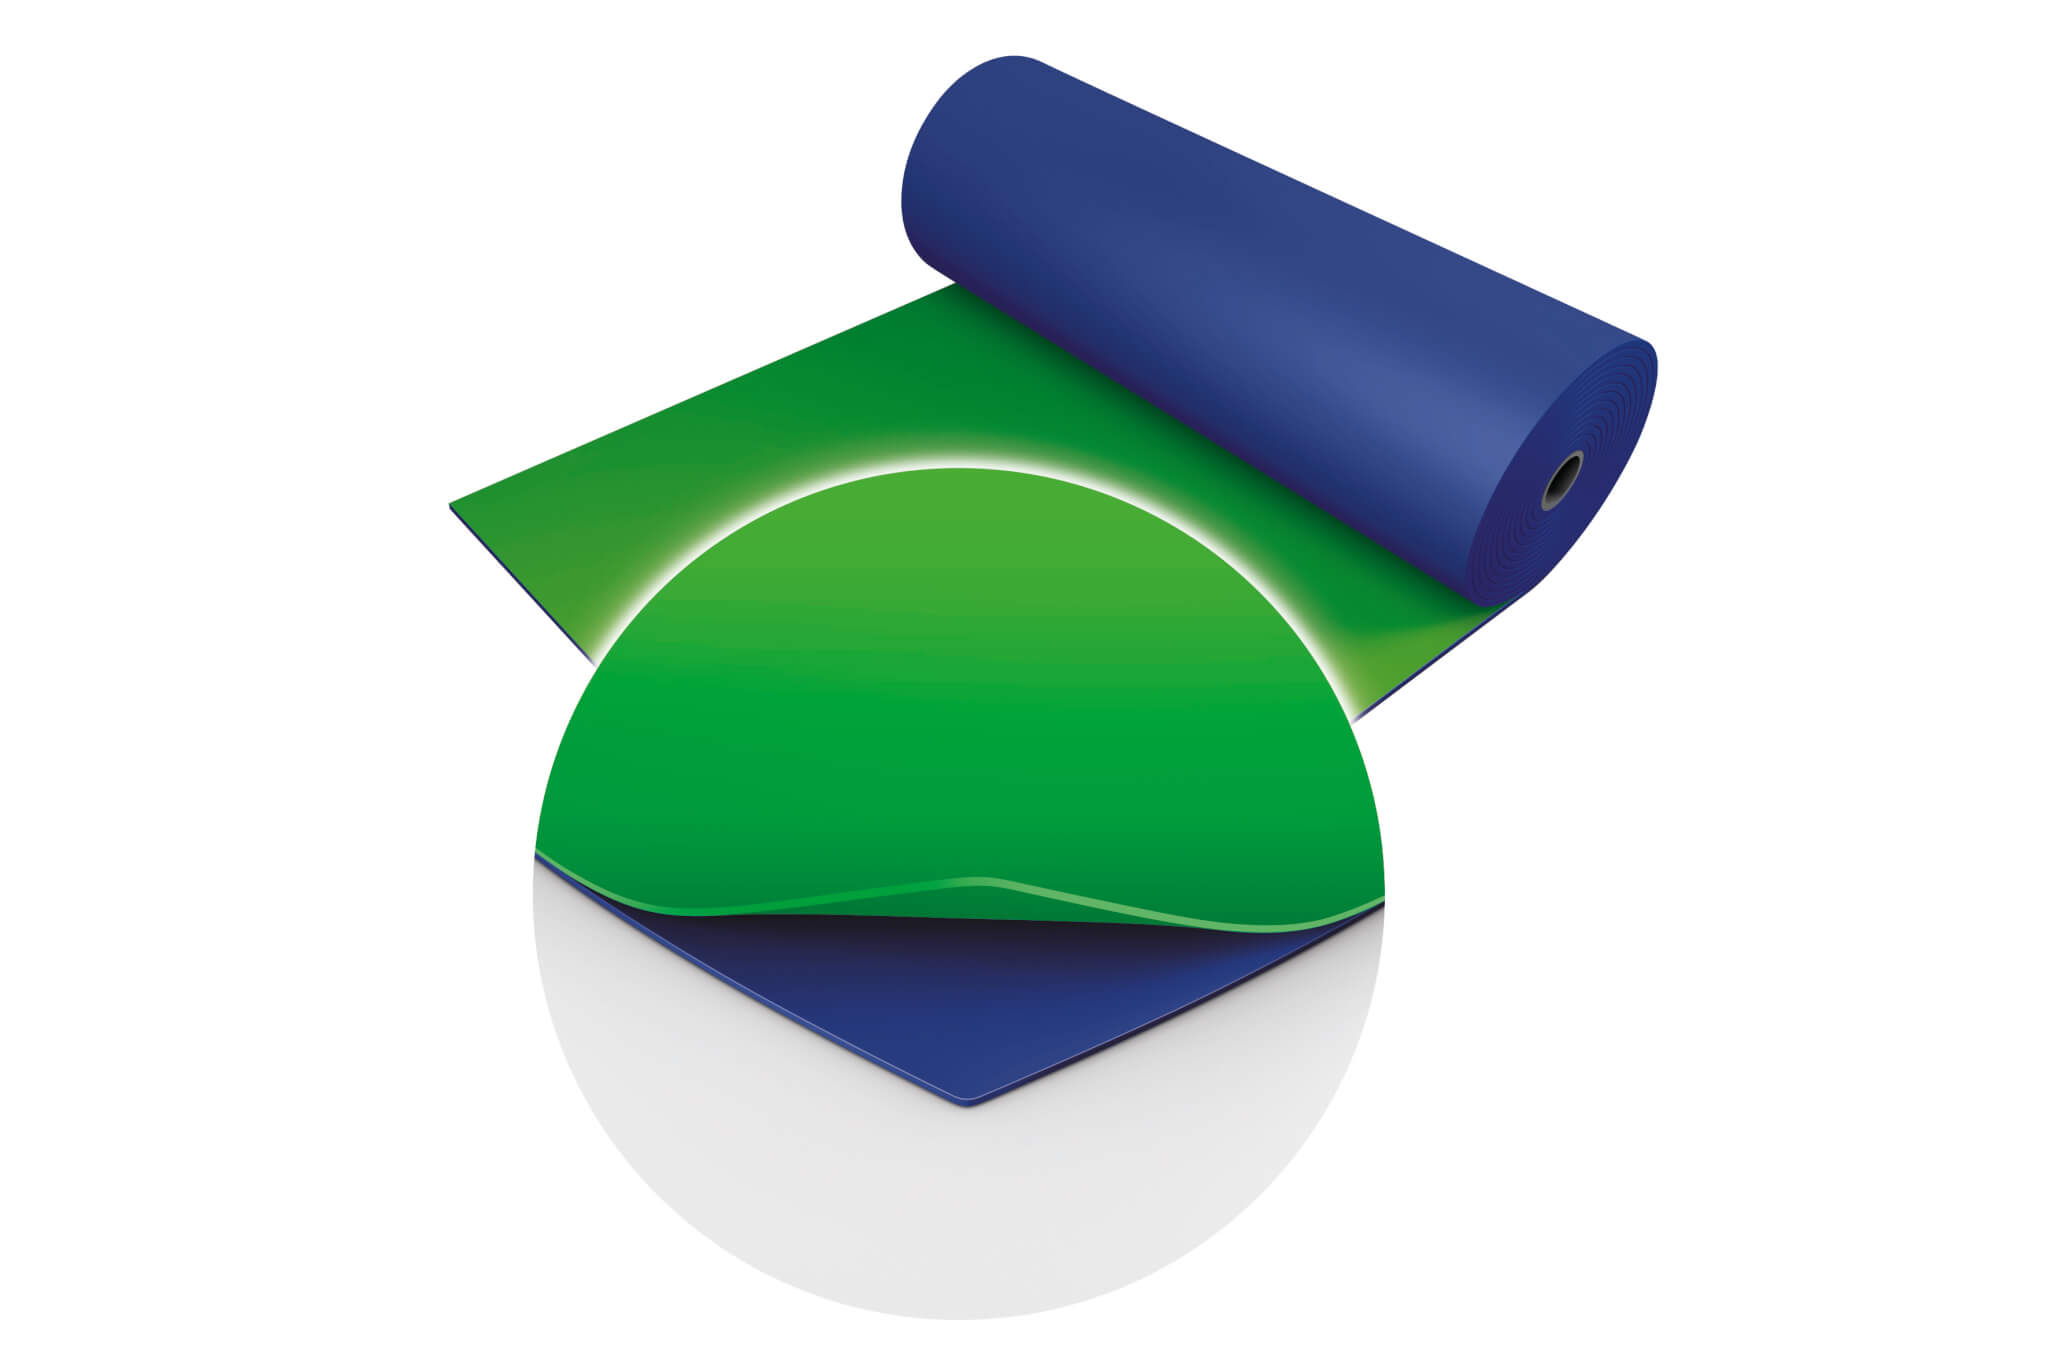 Chroma Key Green/Chroma Key Blue (119)